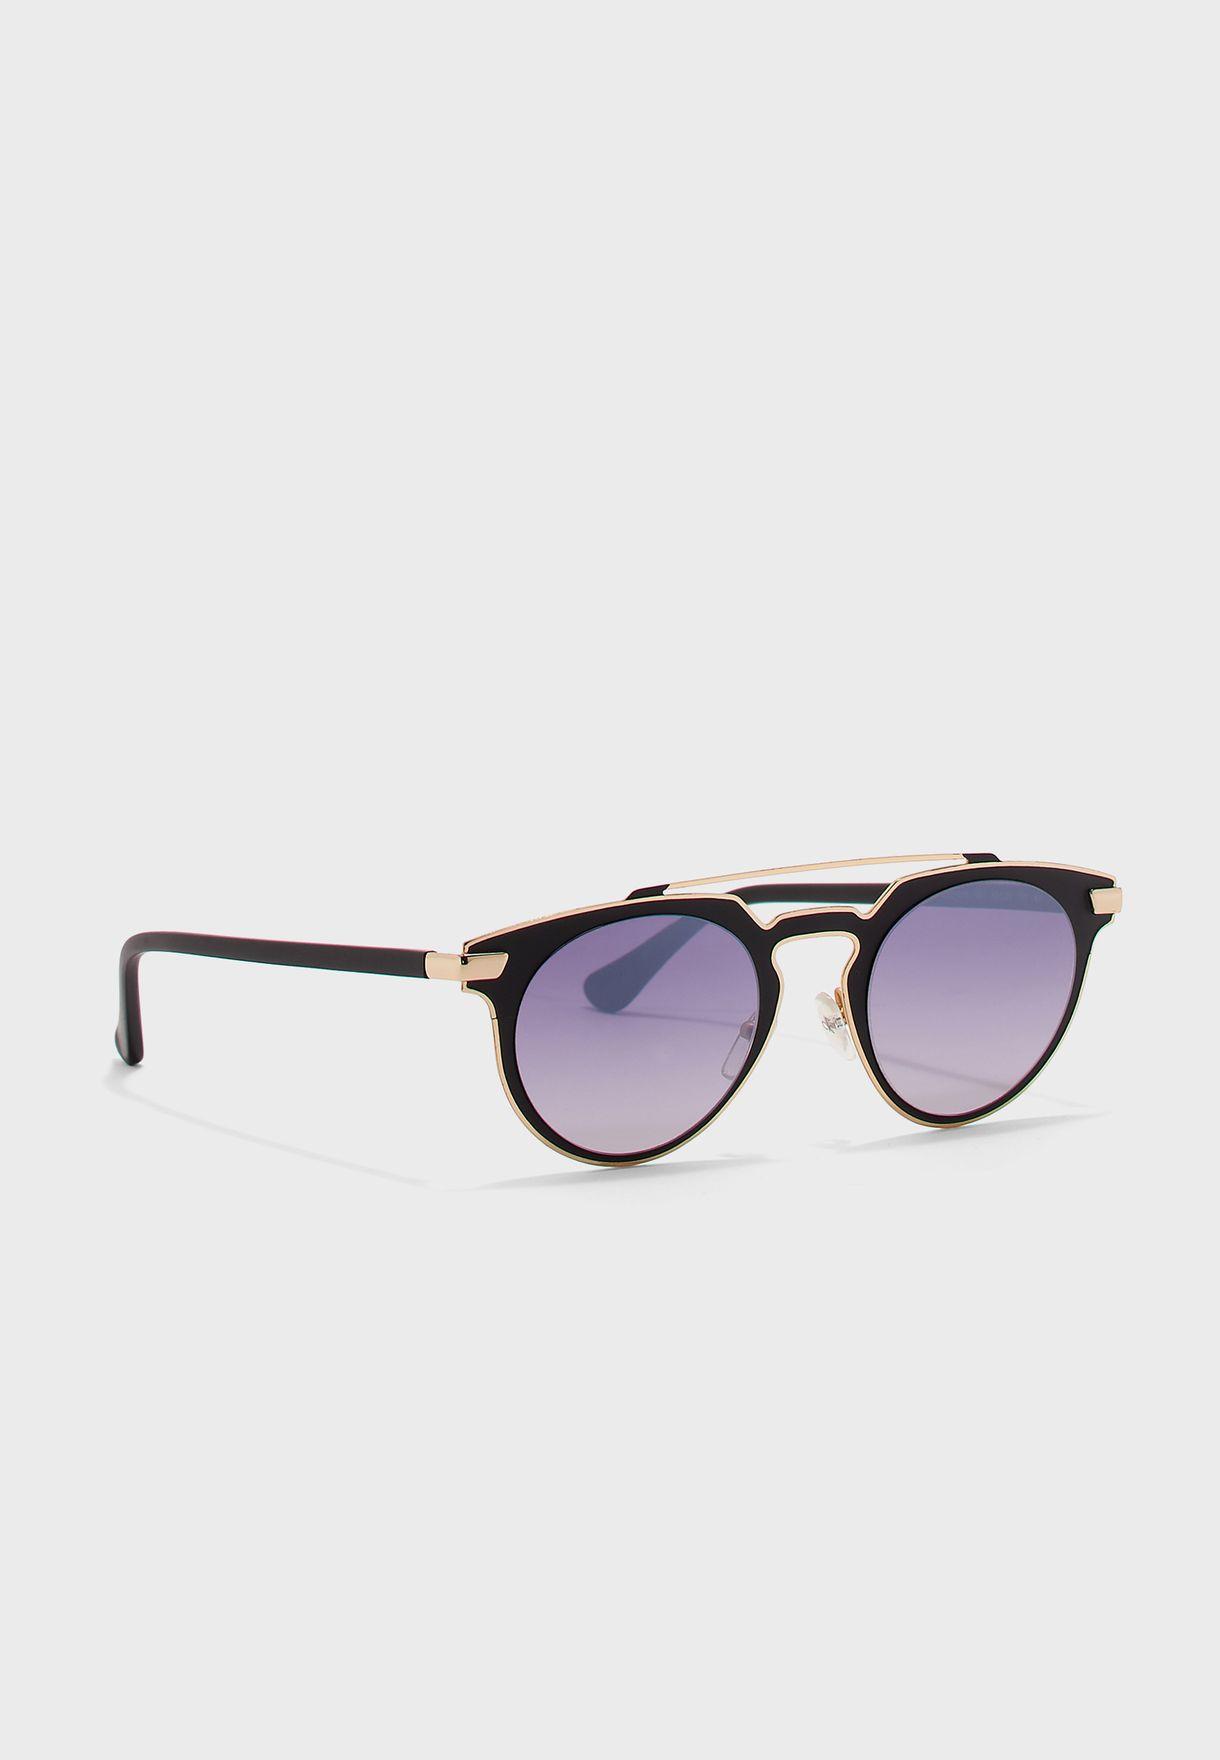 CK2147S Round Sunglasses